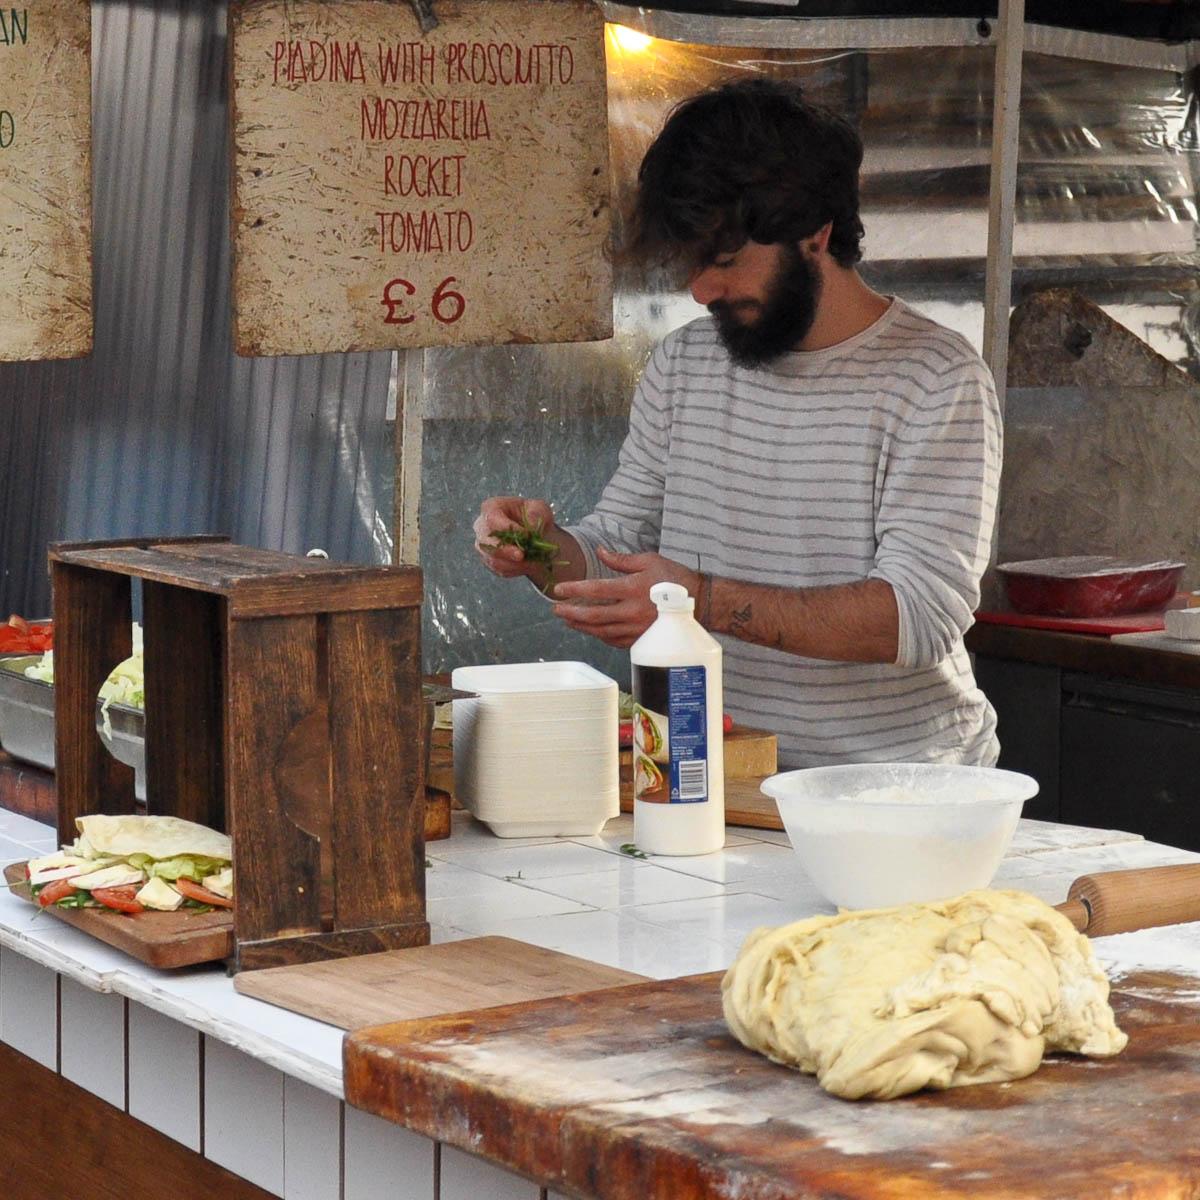 A piadina maker, Camden Lock Market, Camden Town, London, England